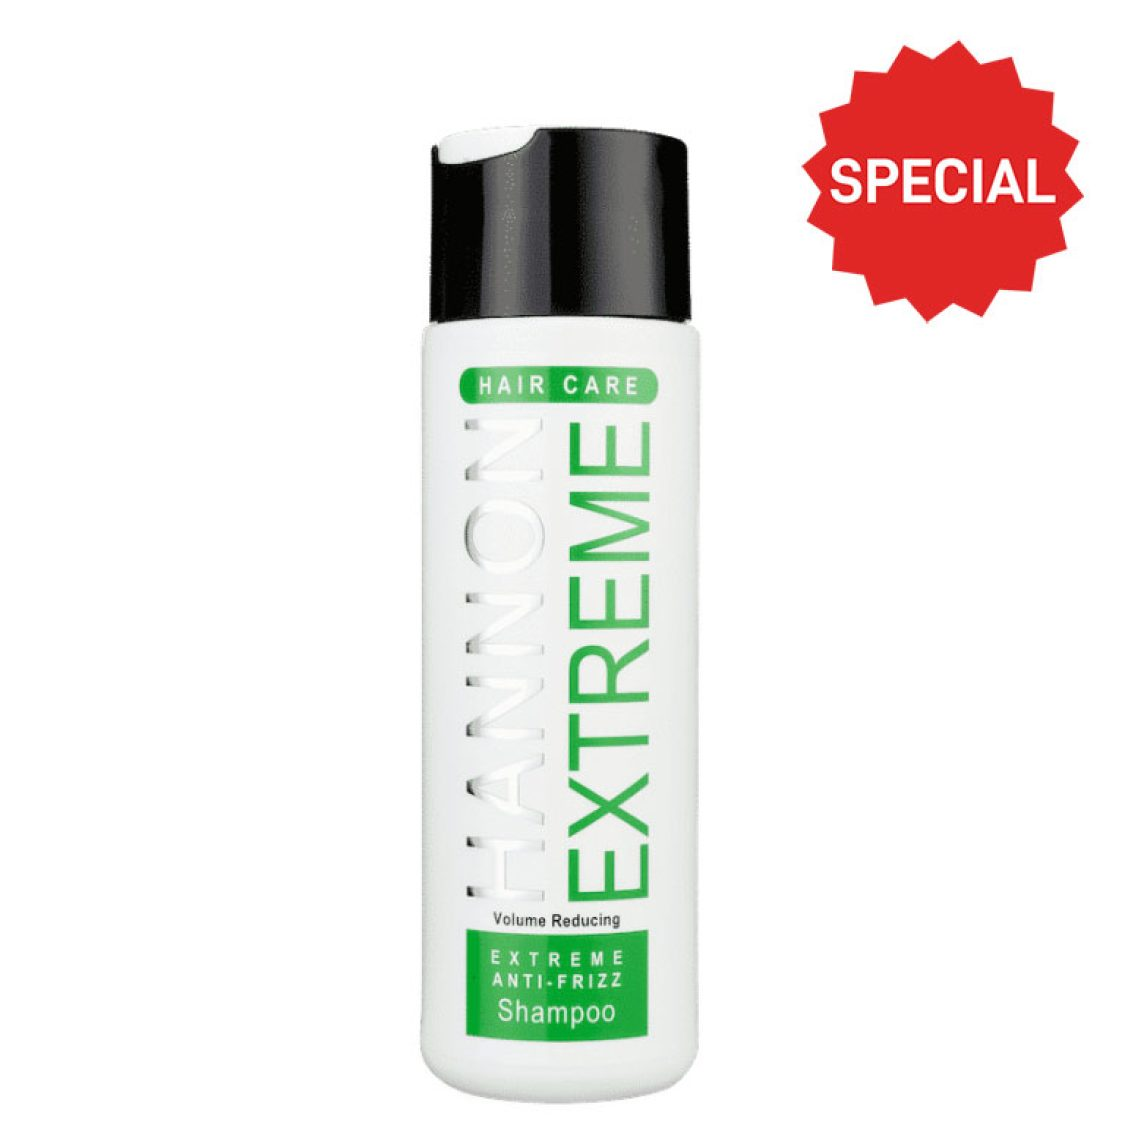 Hannon - EXTREME Anti-Frizz Shampoo 250ml